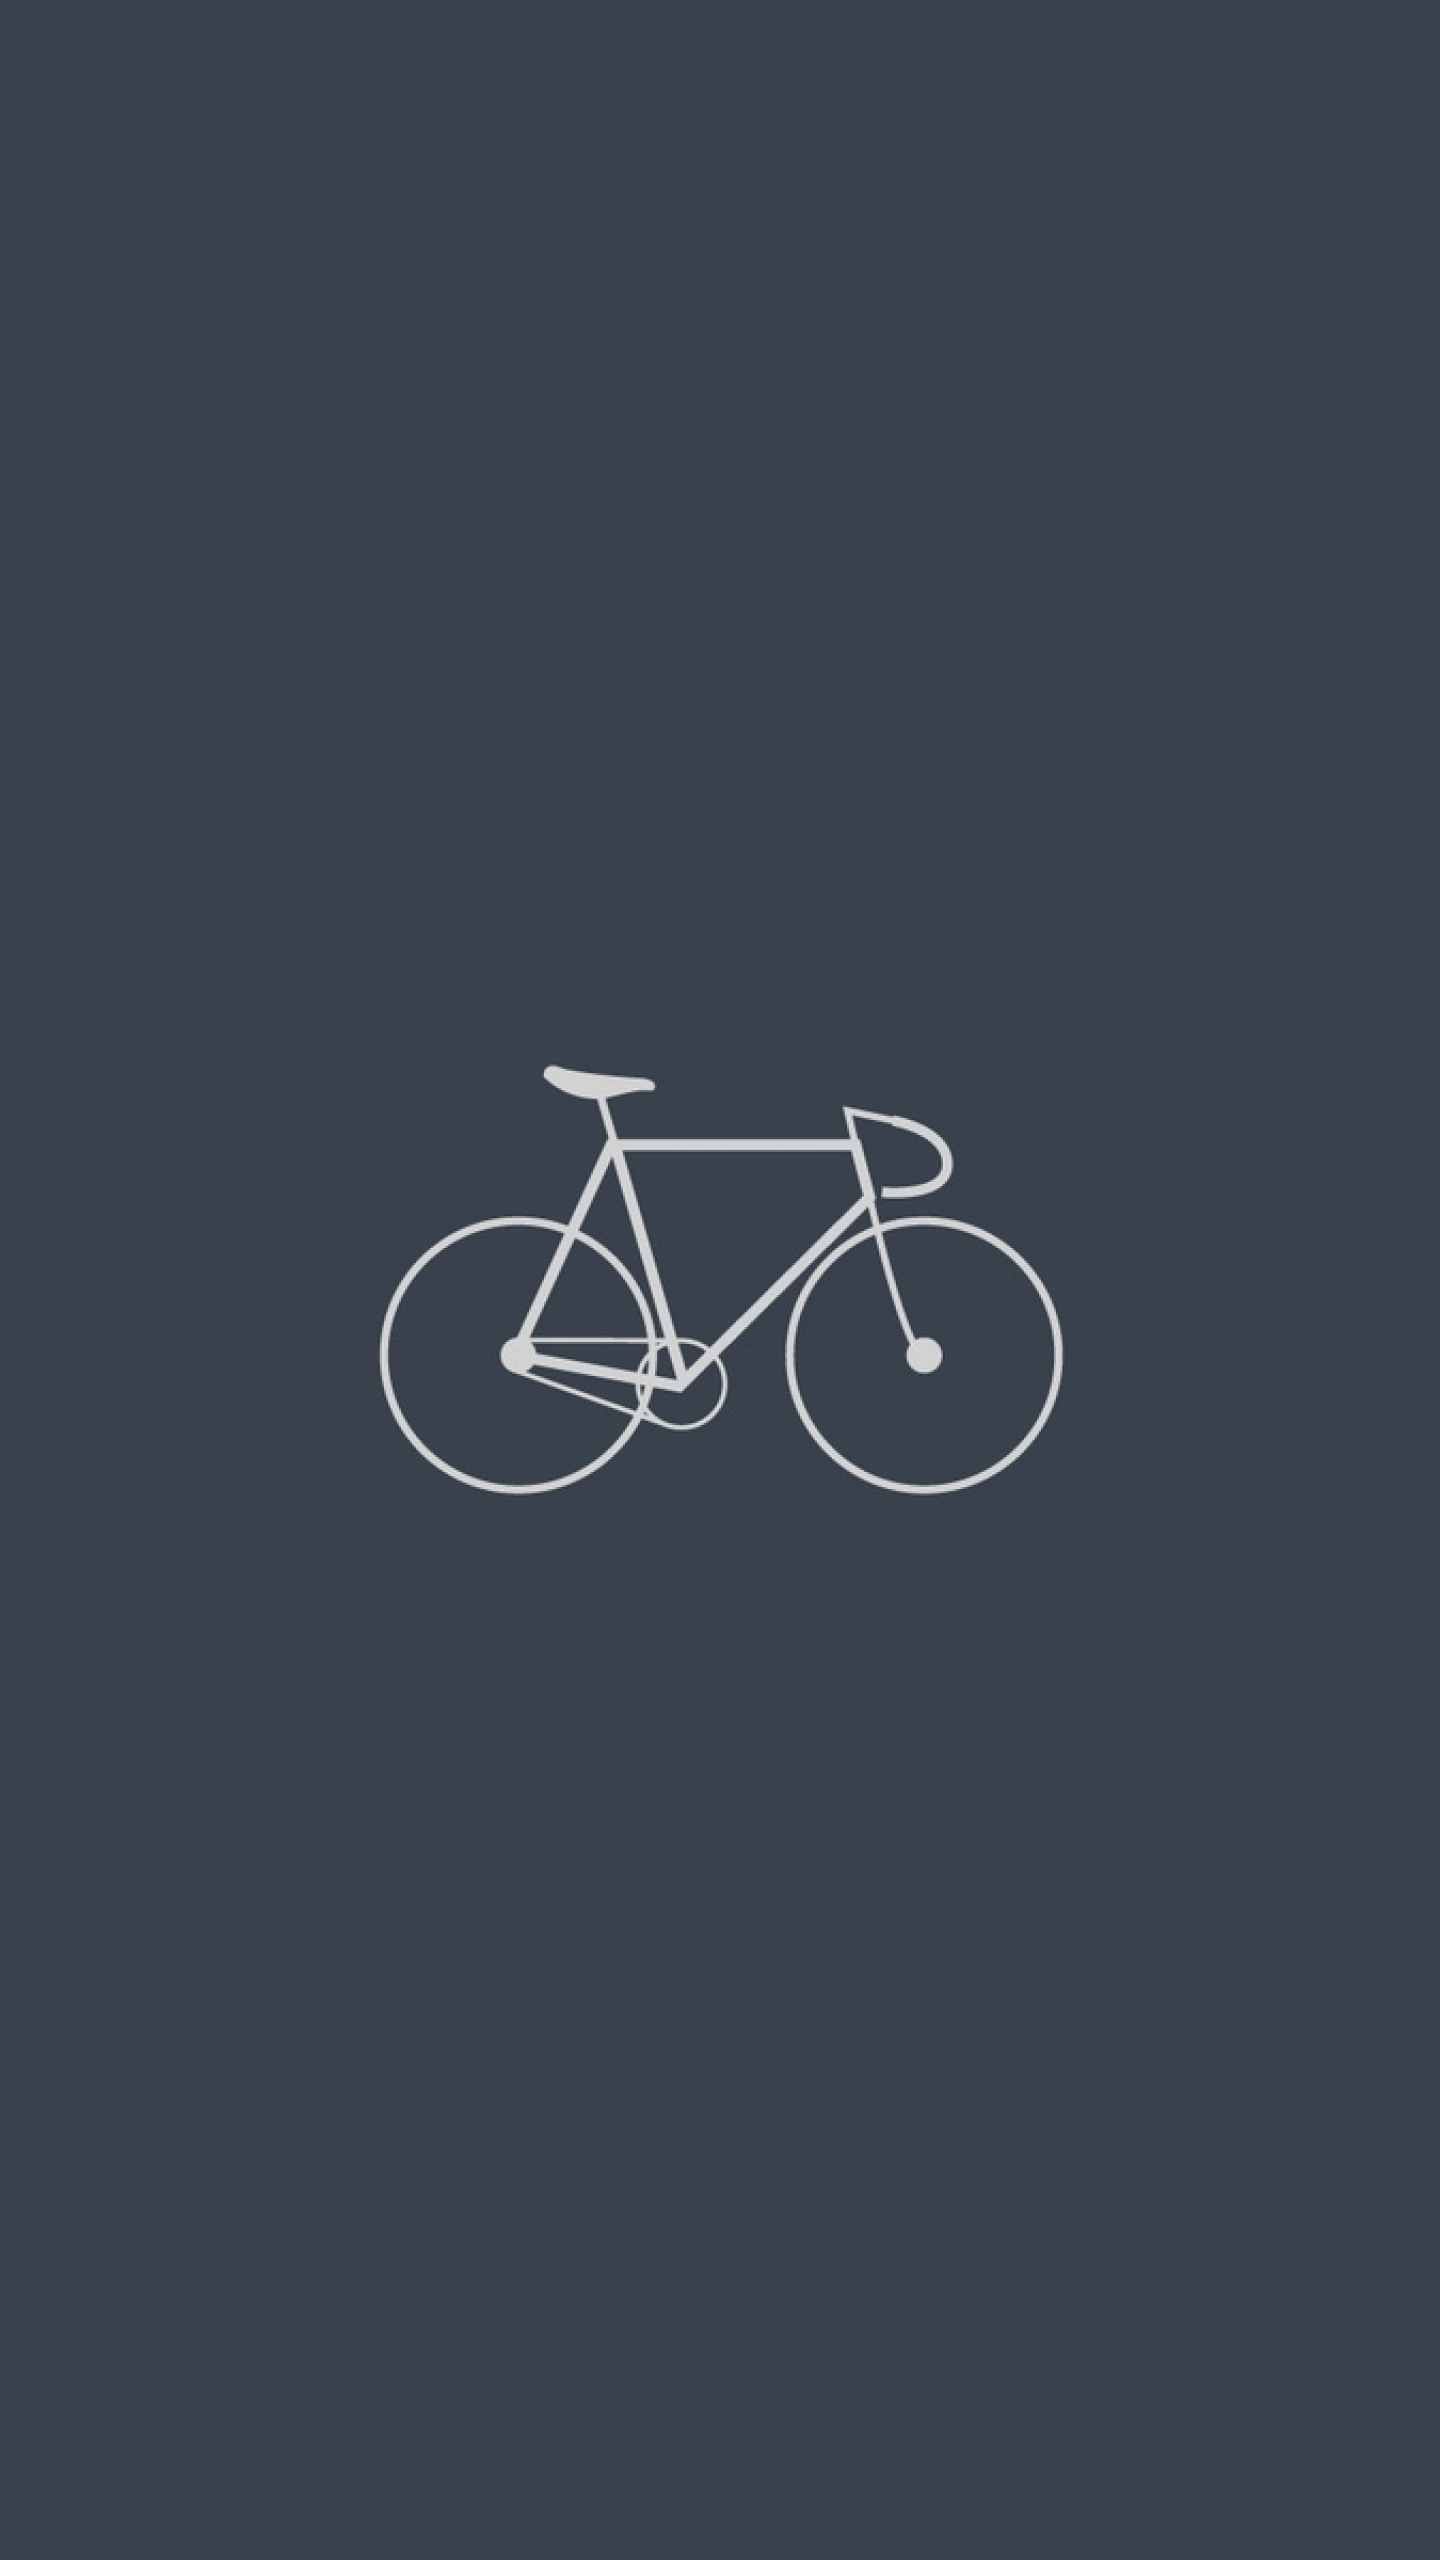 Wallpplus | Fondos de pantalla - Minimalista en HD